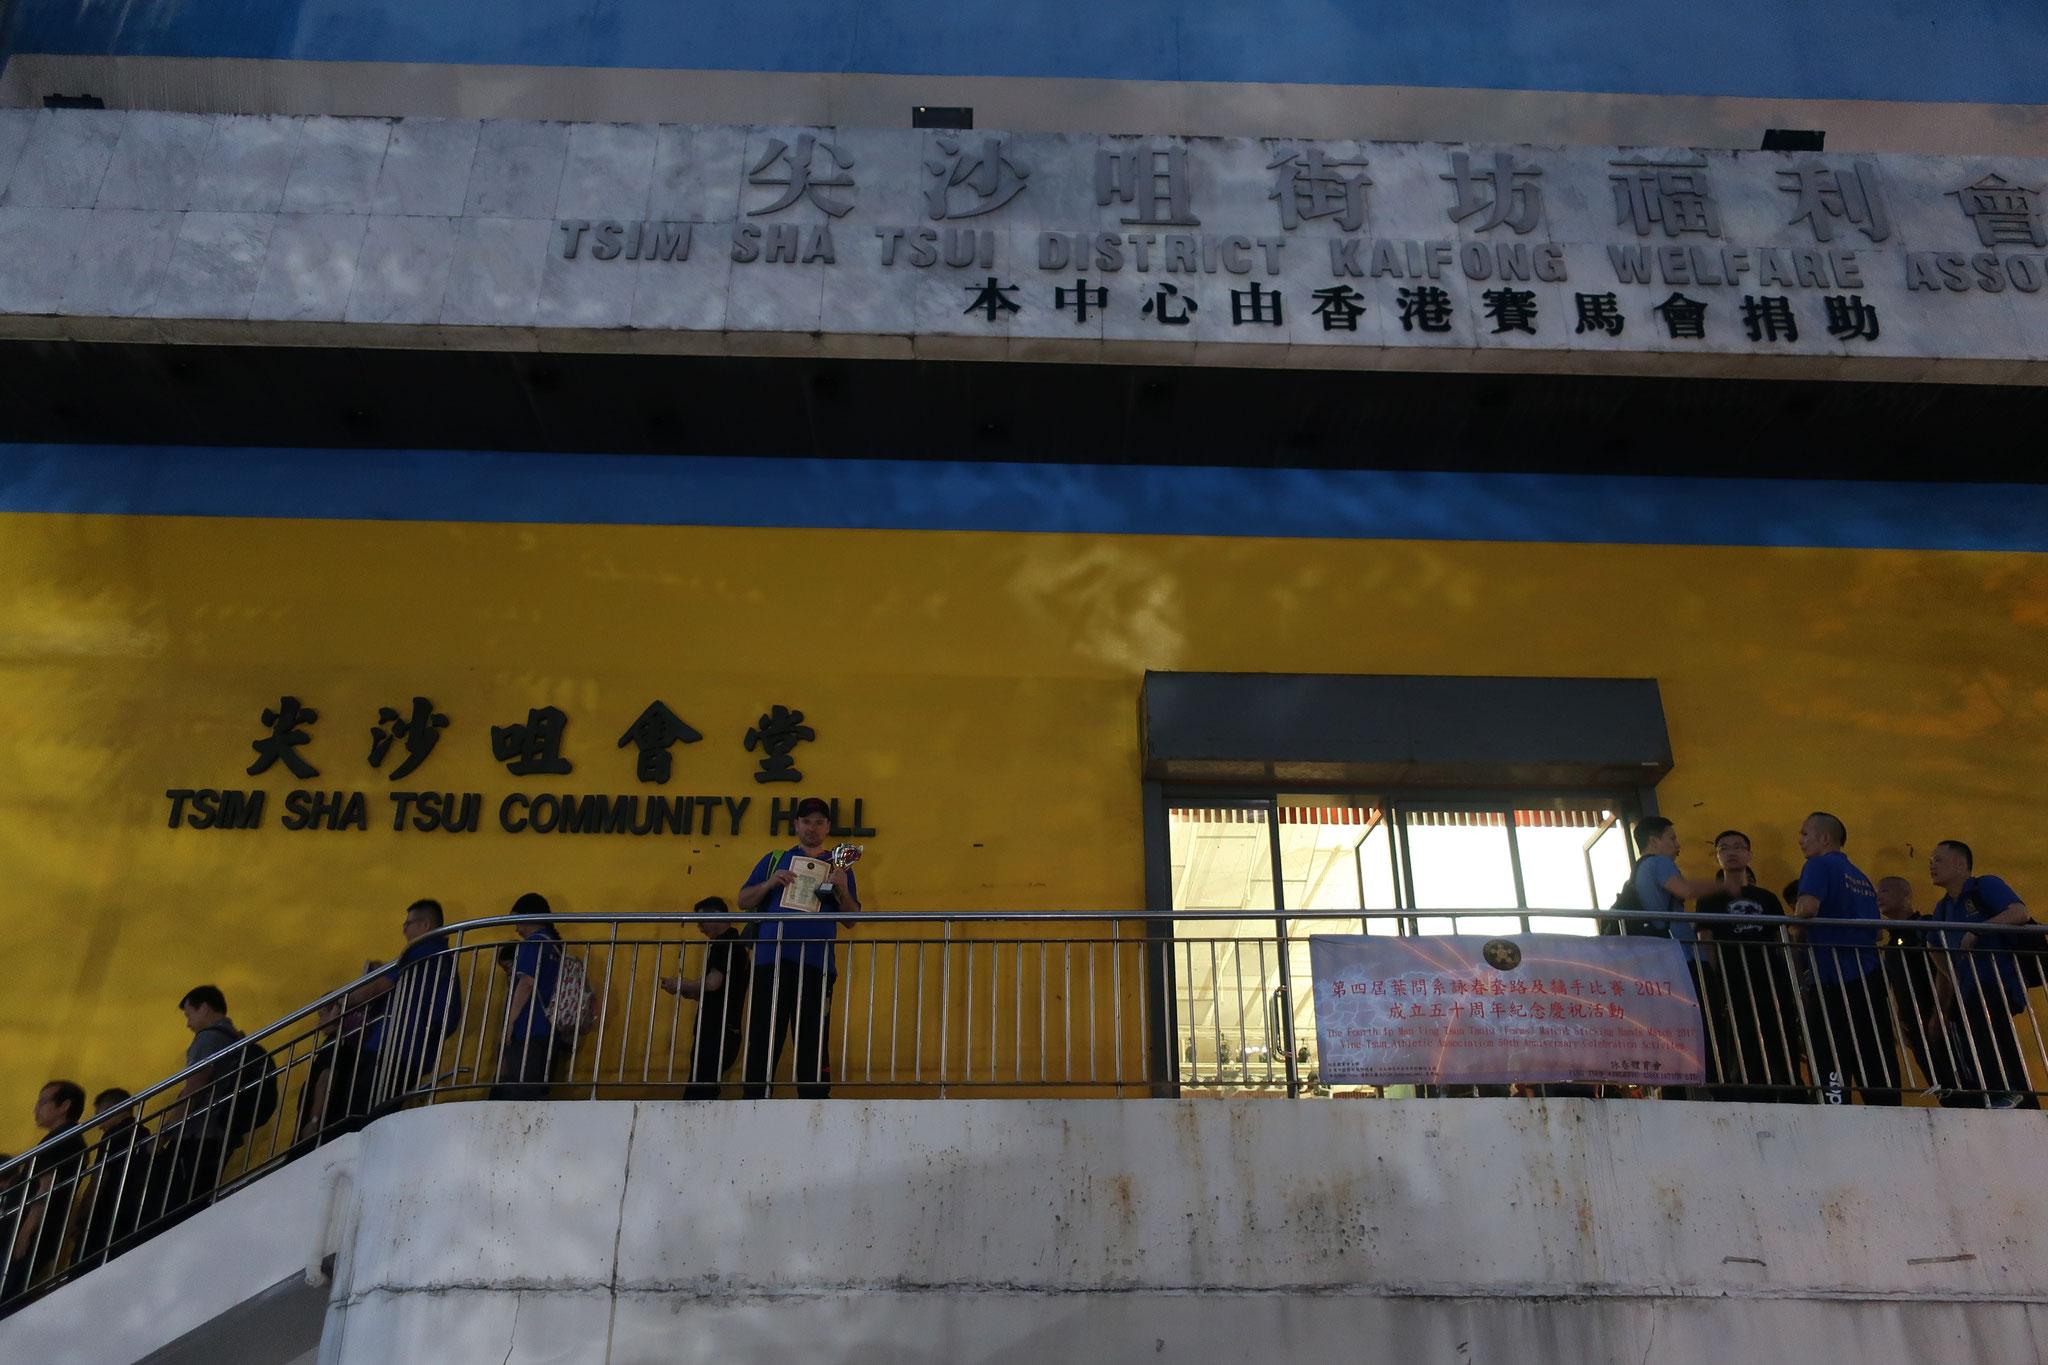 Veranstaltungsort Tsim Sha Tsui Community Hongkong